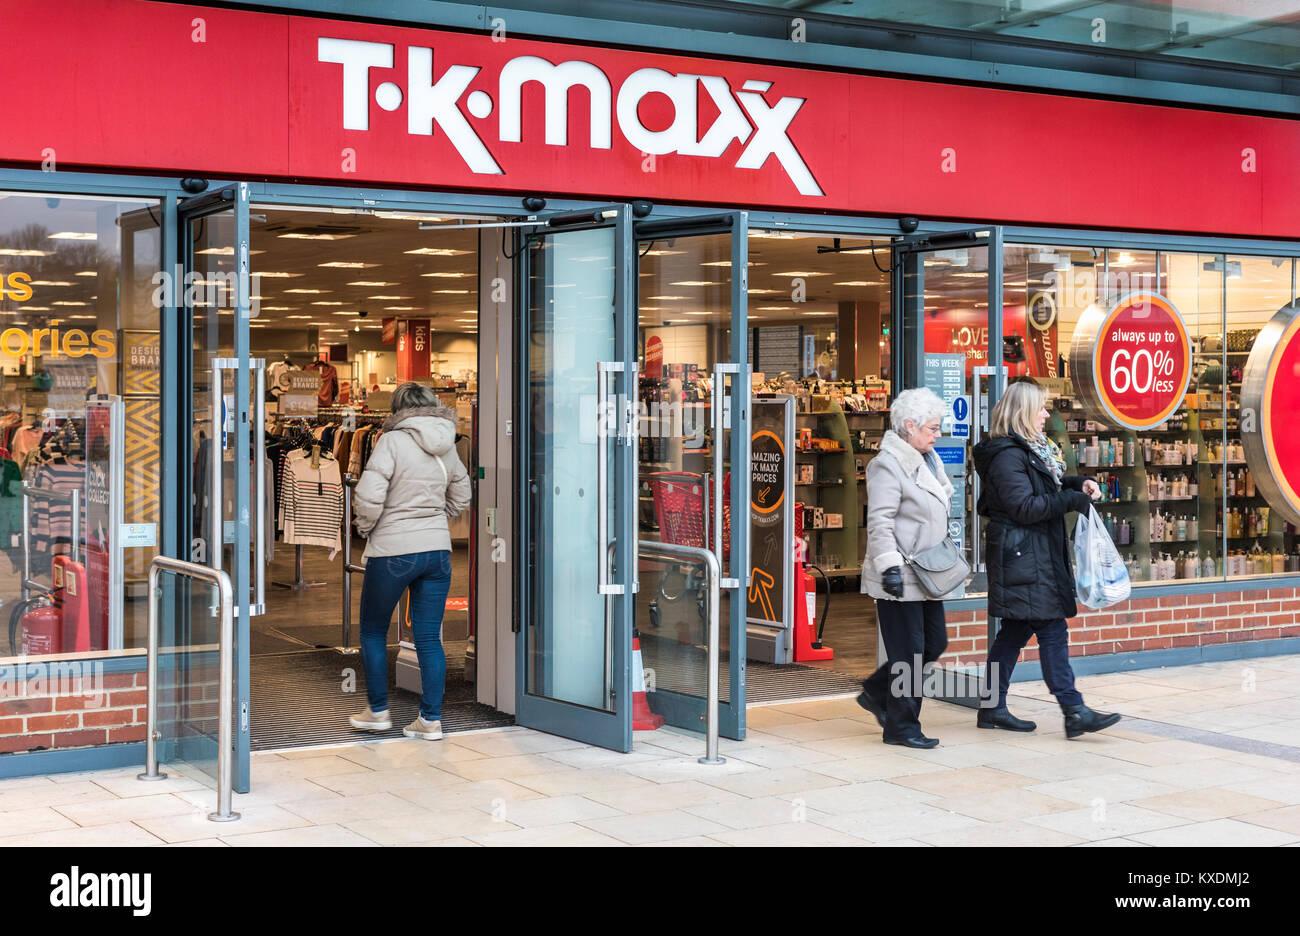 TK Maxx shop front entrance in Horsham, West Sussex, England, UK. - Stock Image